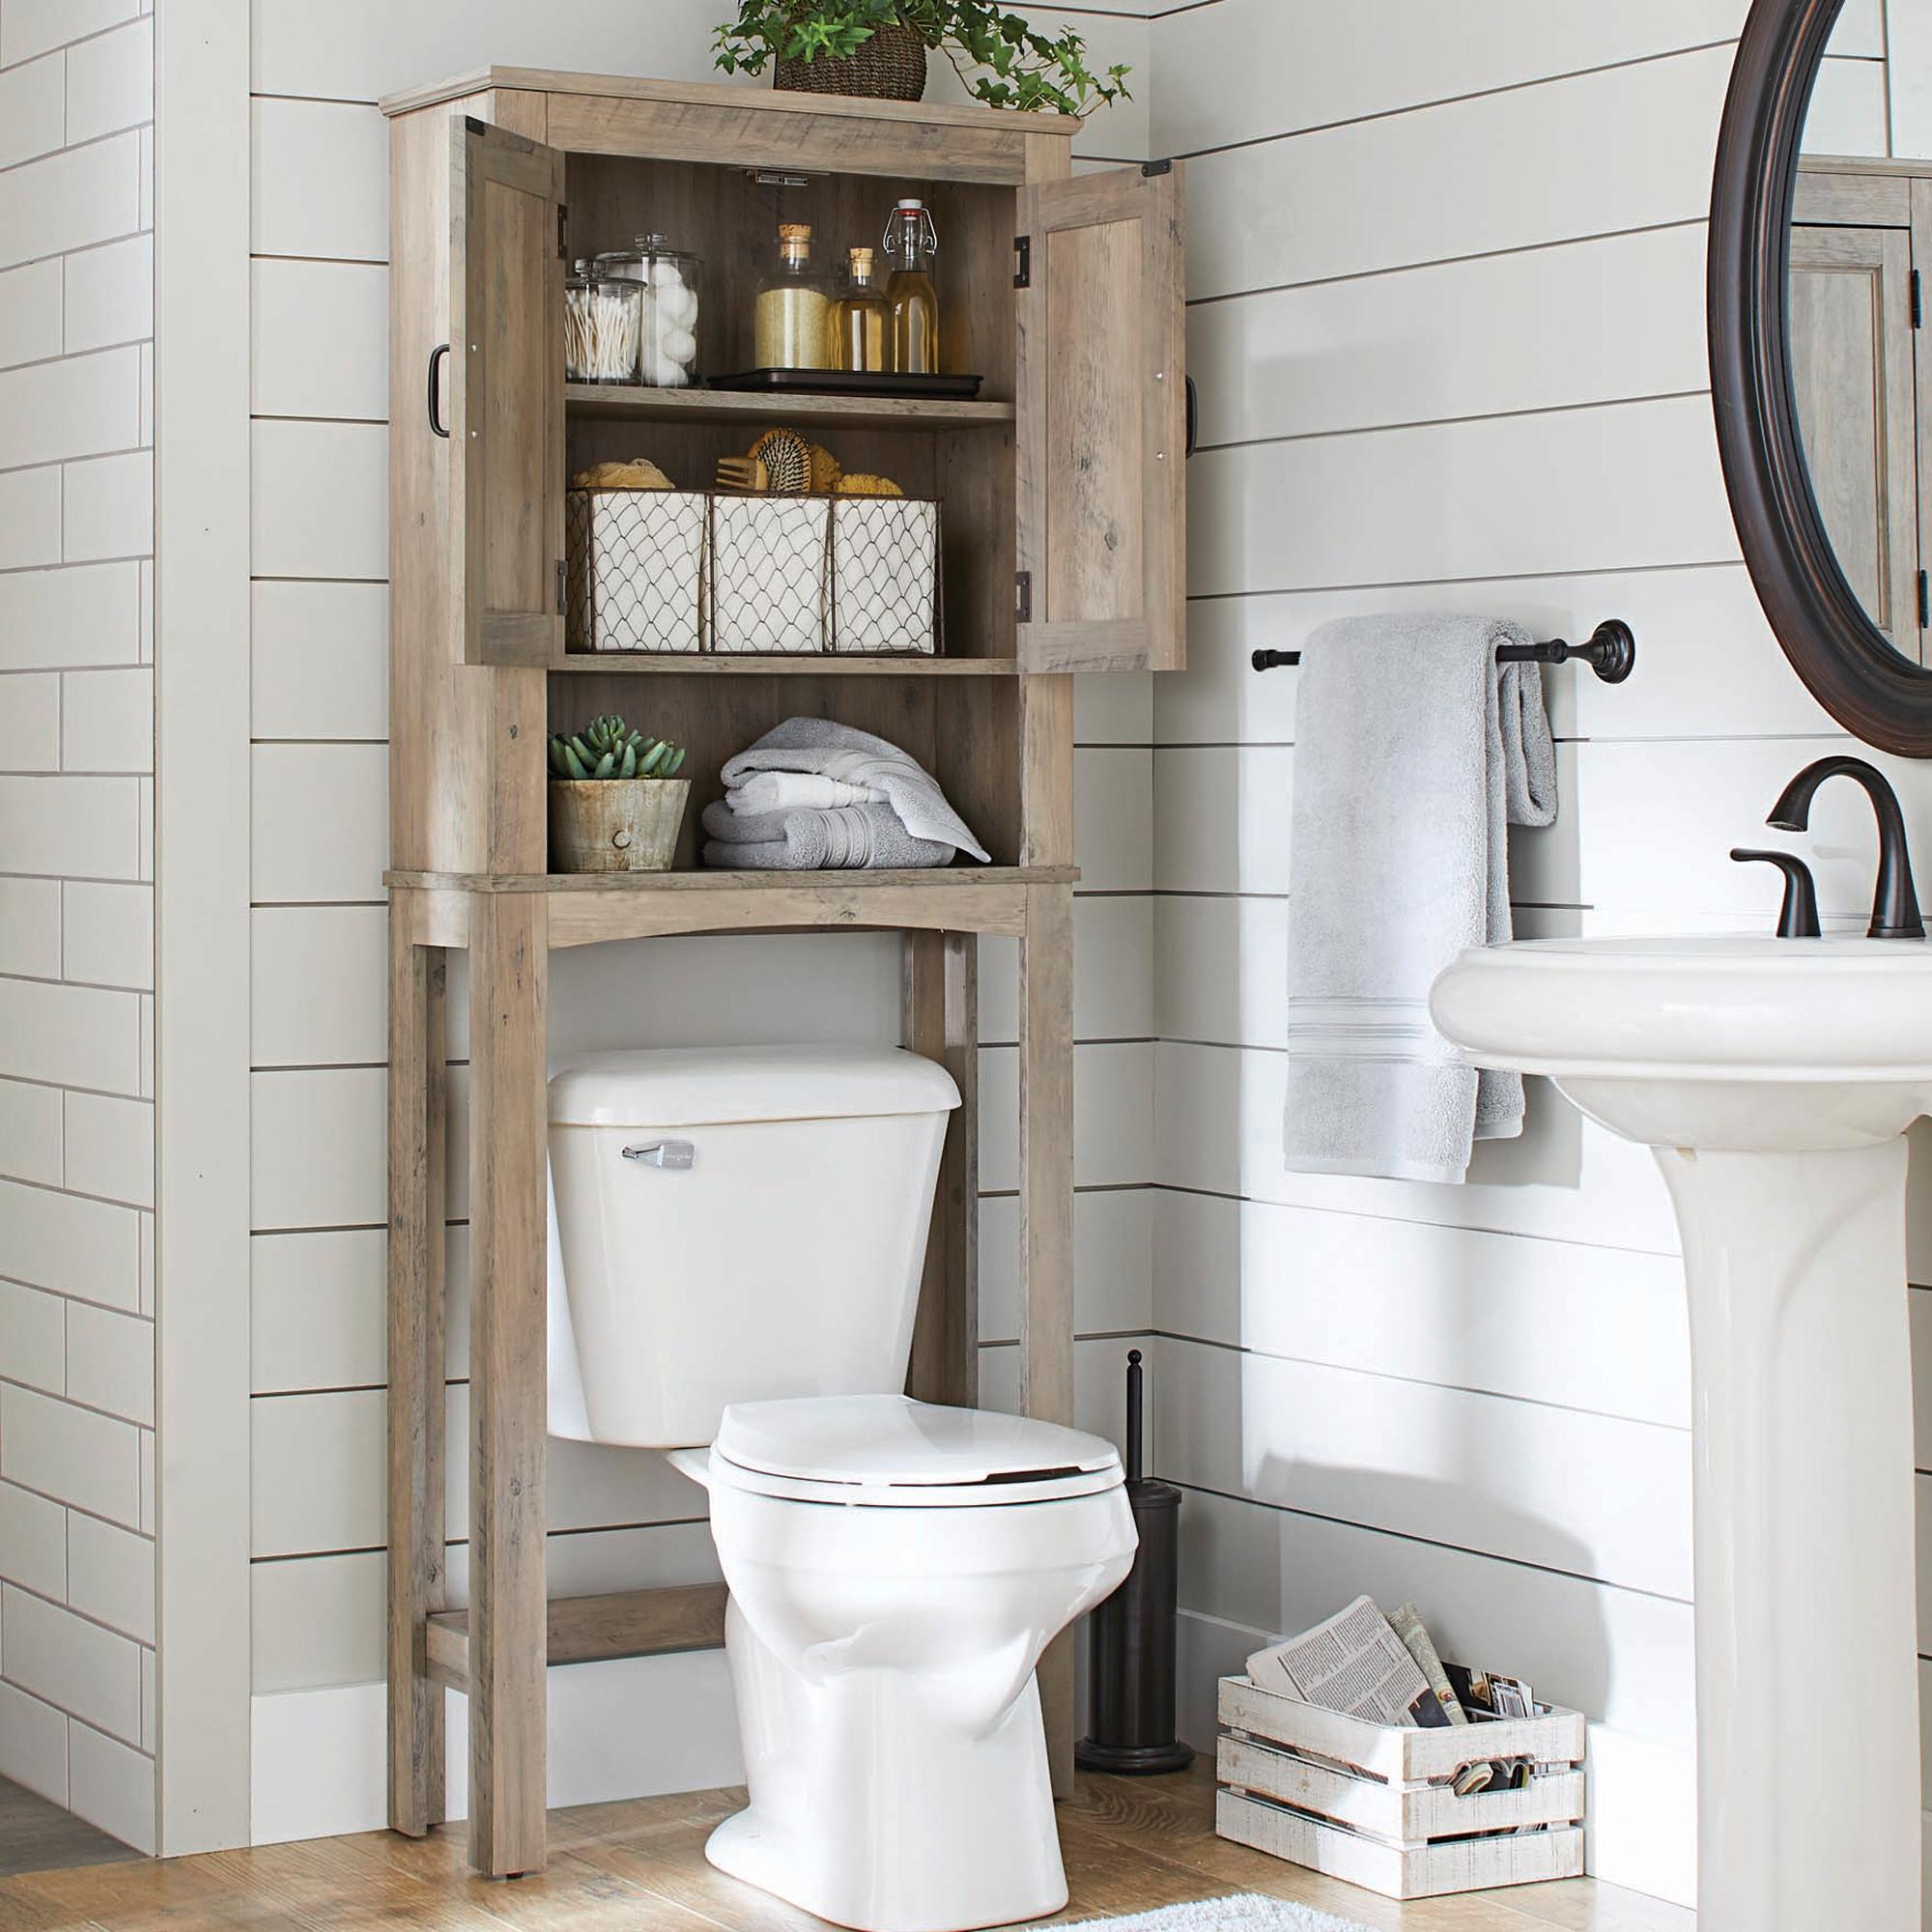 Better Homes Gardens Northampton Over The Toilet Bathroom Space Saver Rustic Gray Finish regarding measurements 2000 X 2000